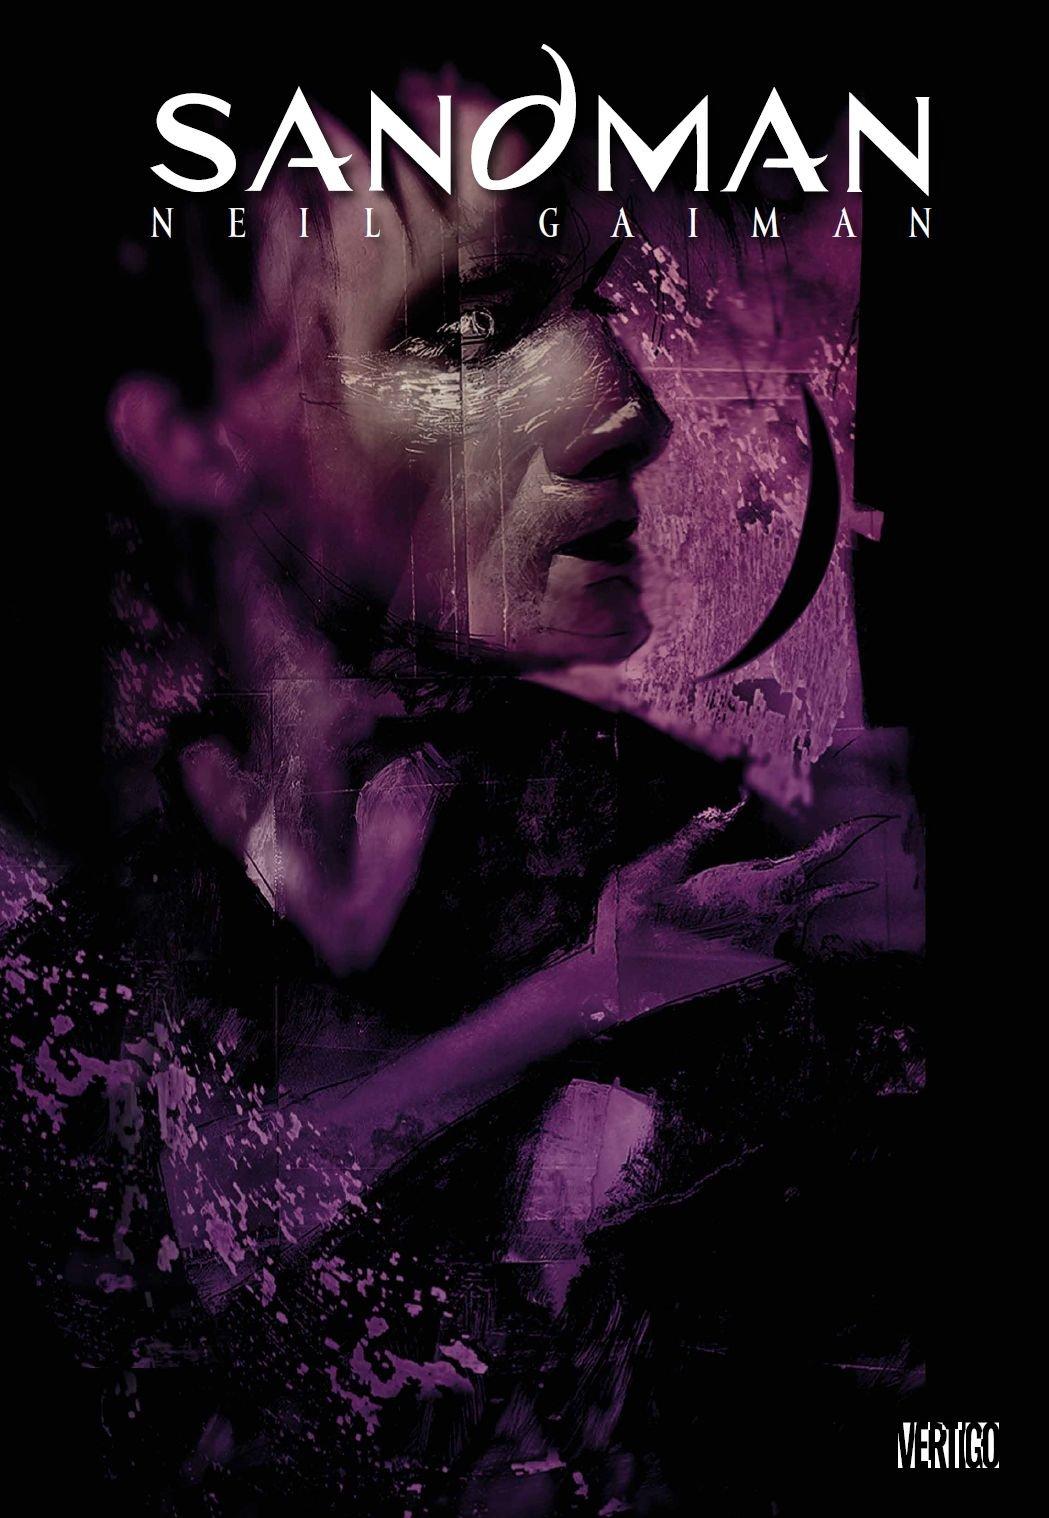 Sandman Deluxe: Bd. 4: Über die See zum Himmel